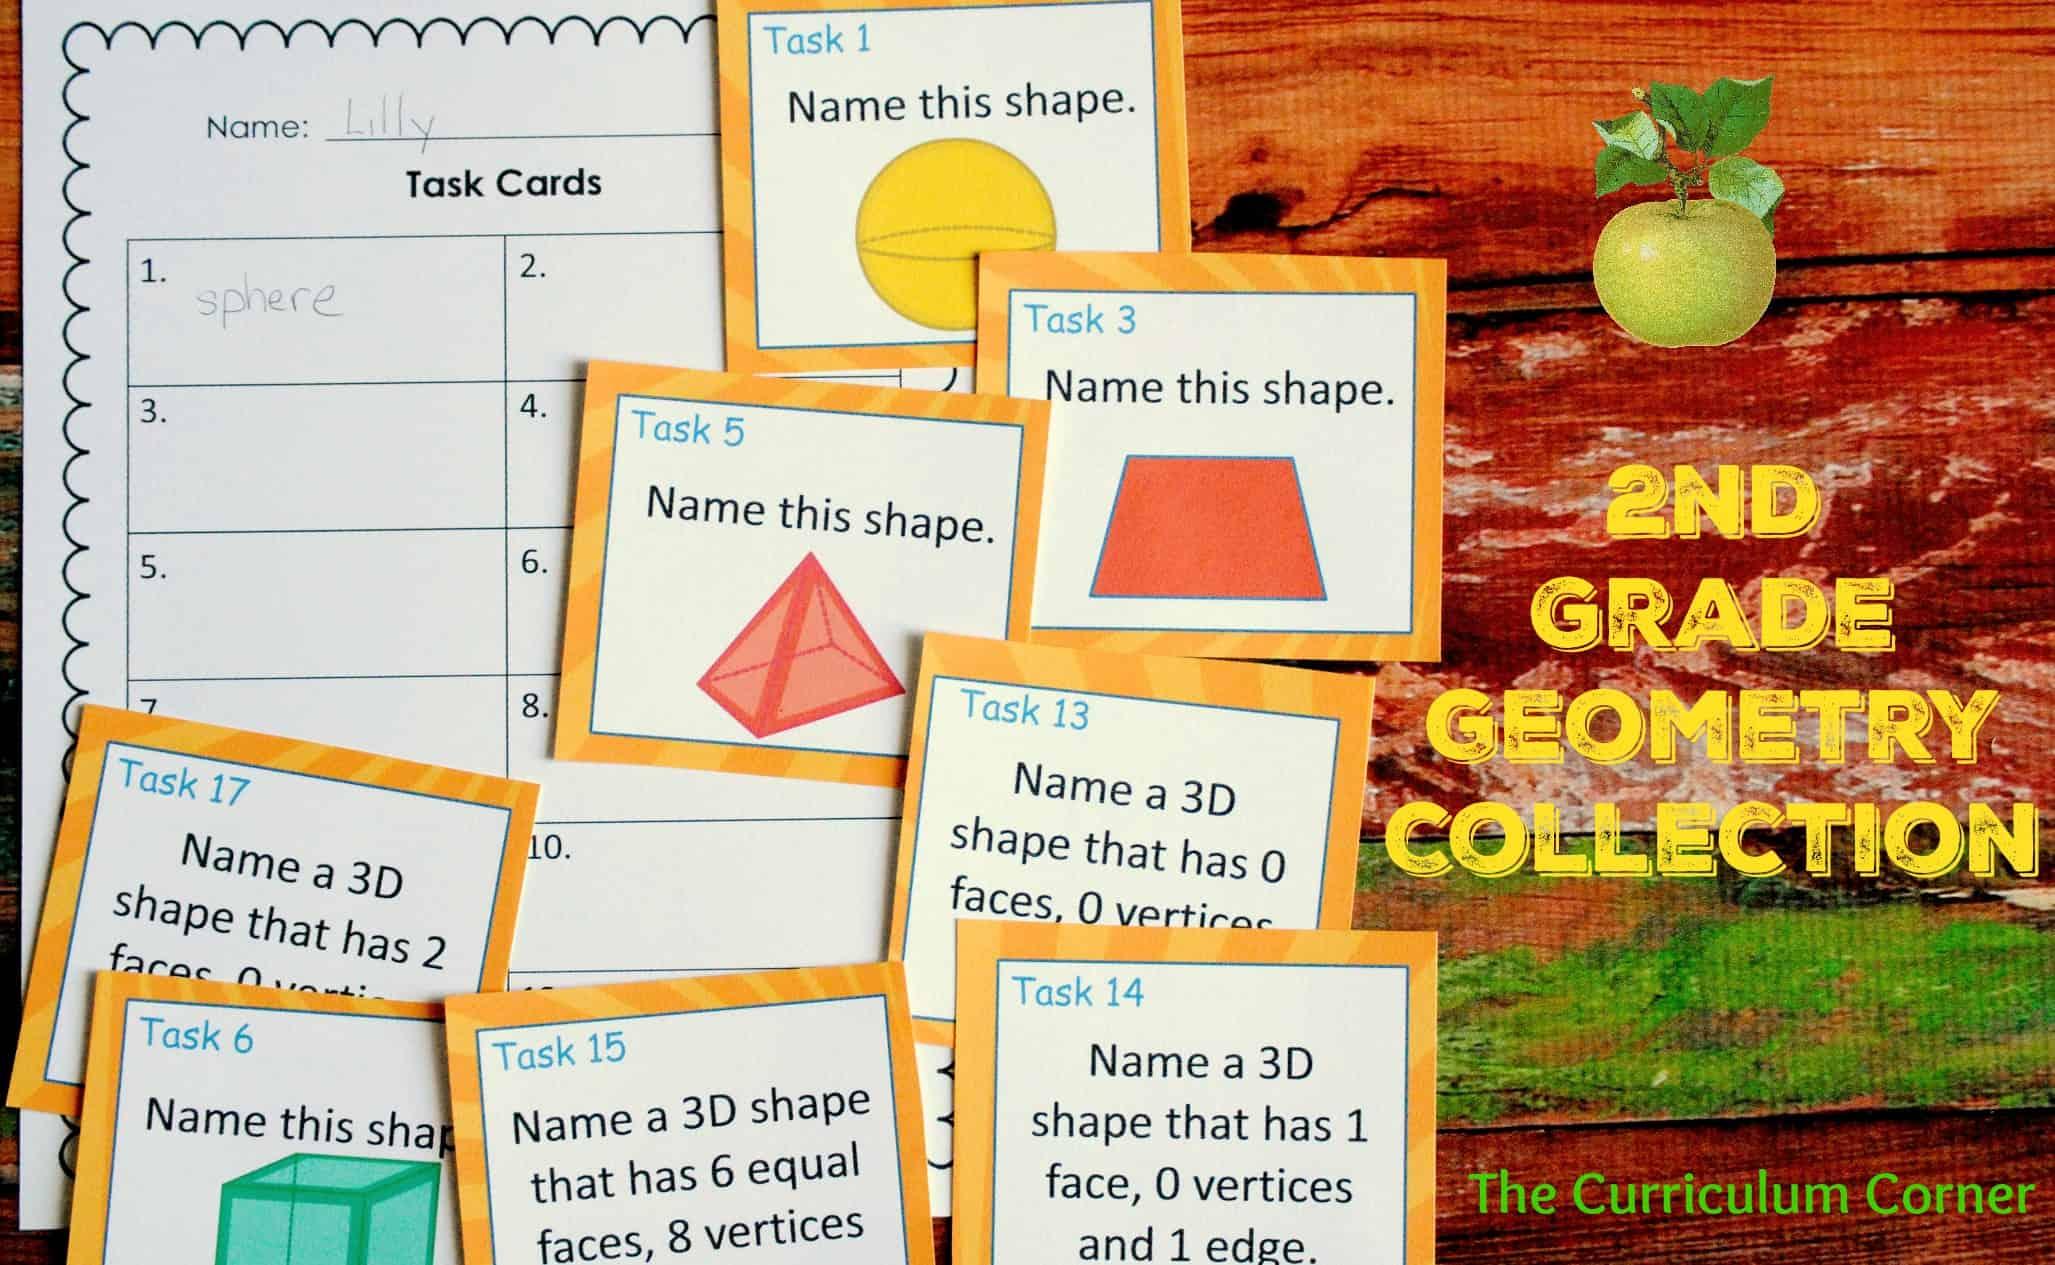 medium resolution of 2nd Grade Geometry - The Curriculum Corner 123